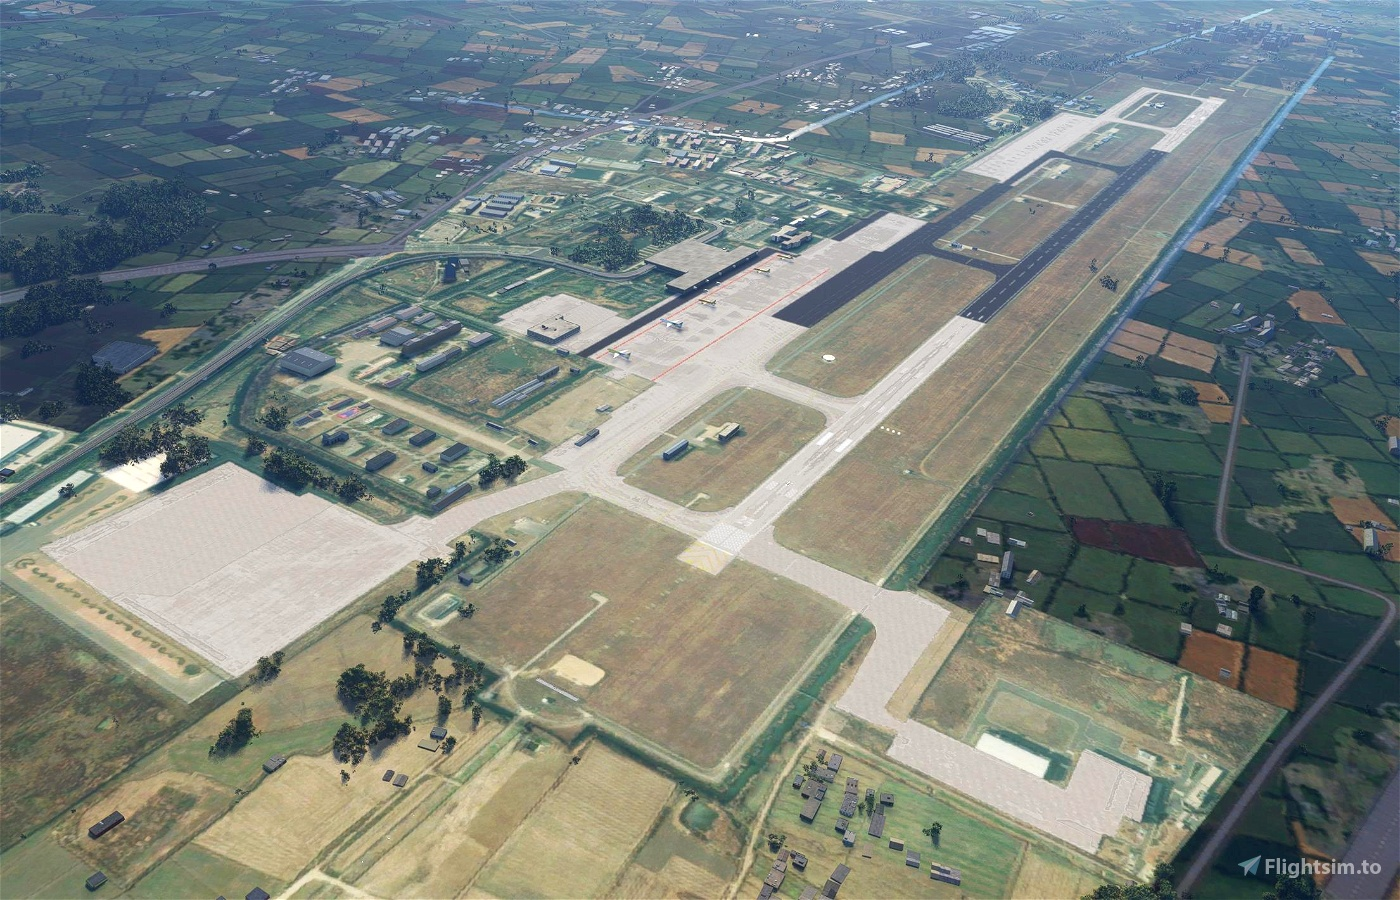 ZSCG - Changzhou Benniu International Airport Microsoft Flight Simulator